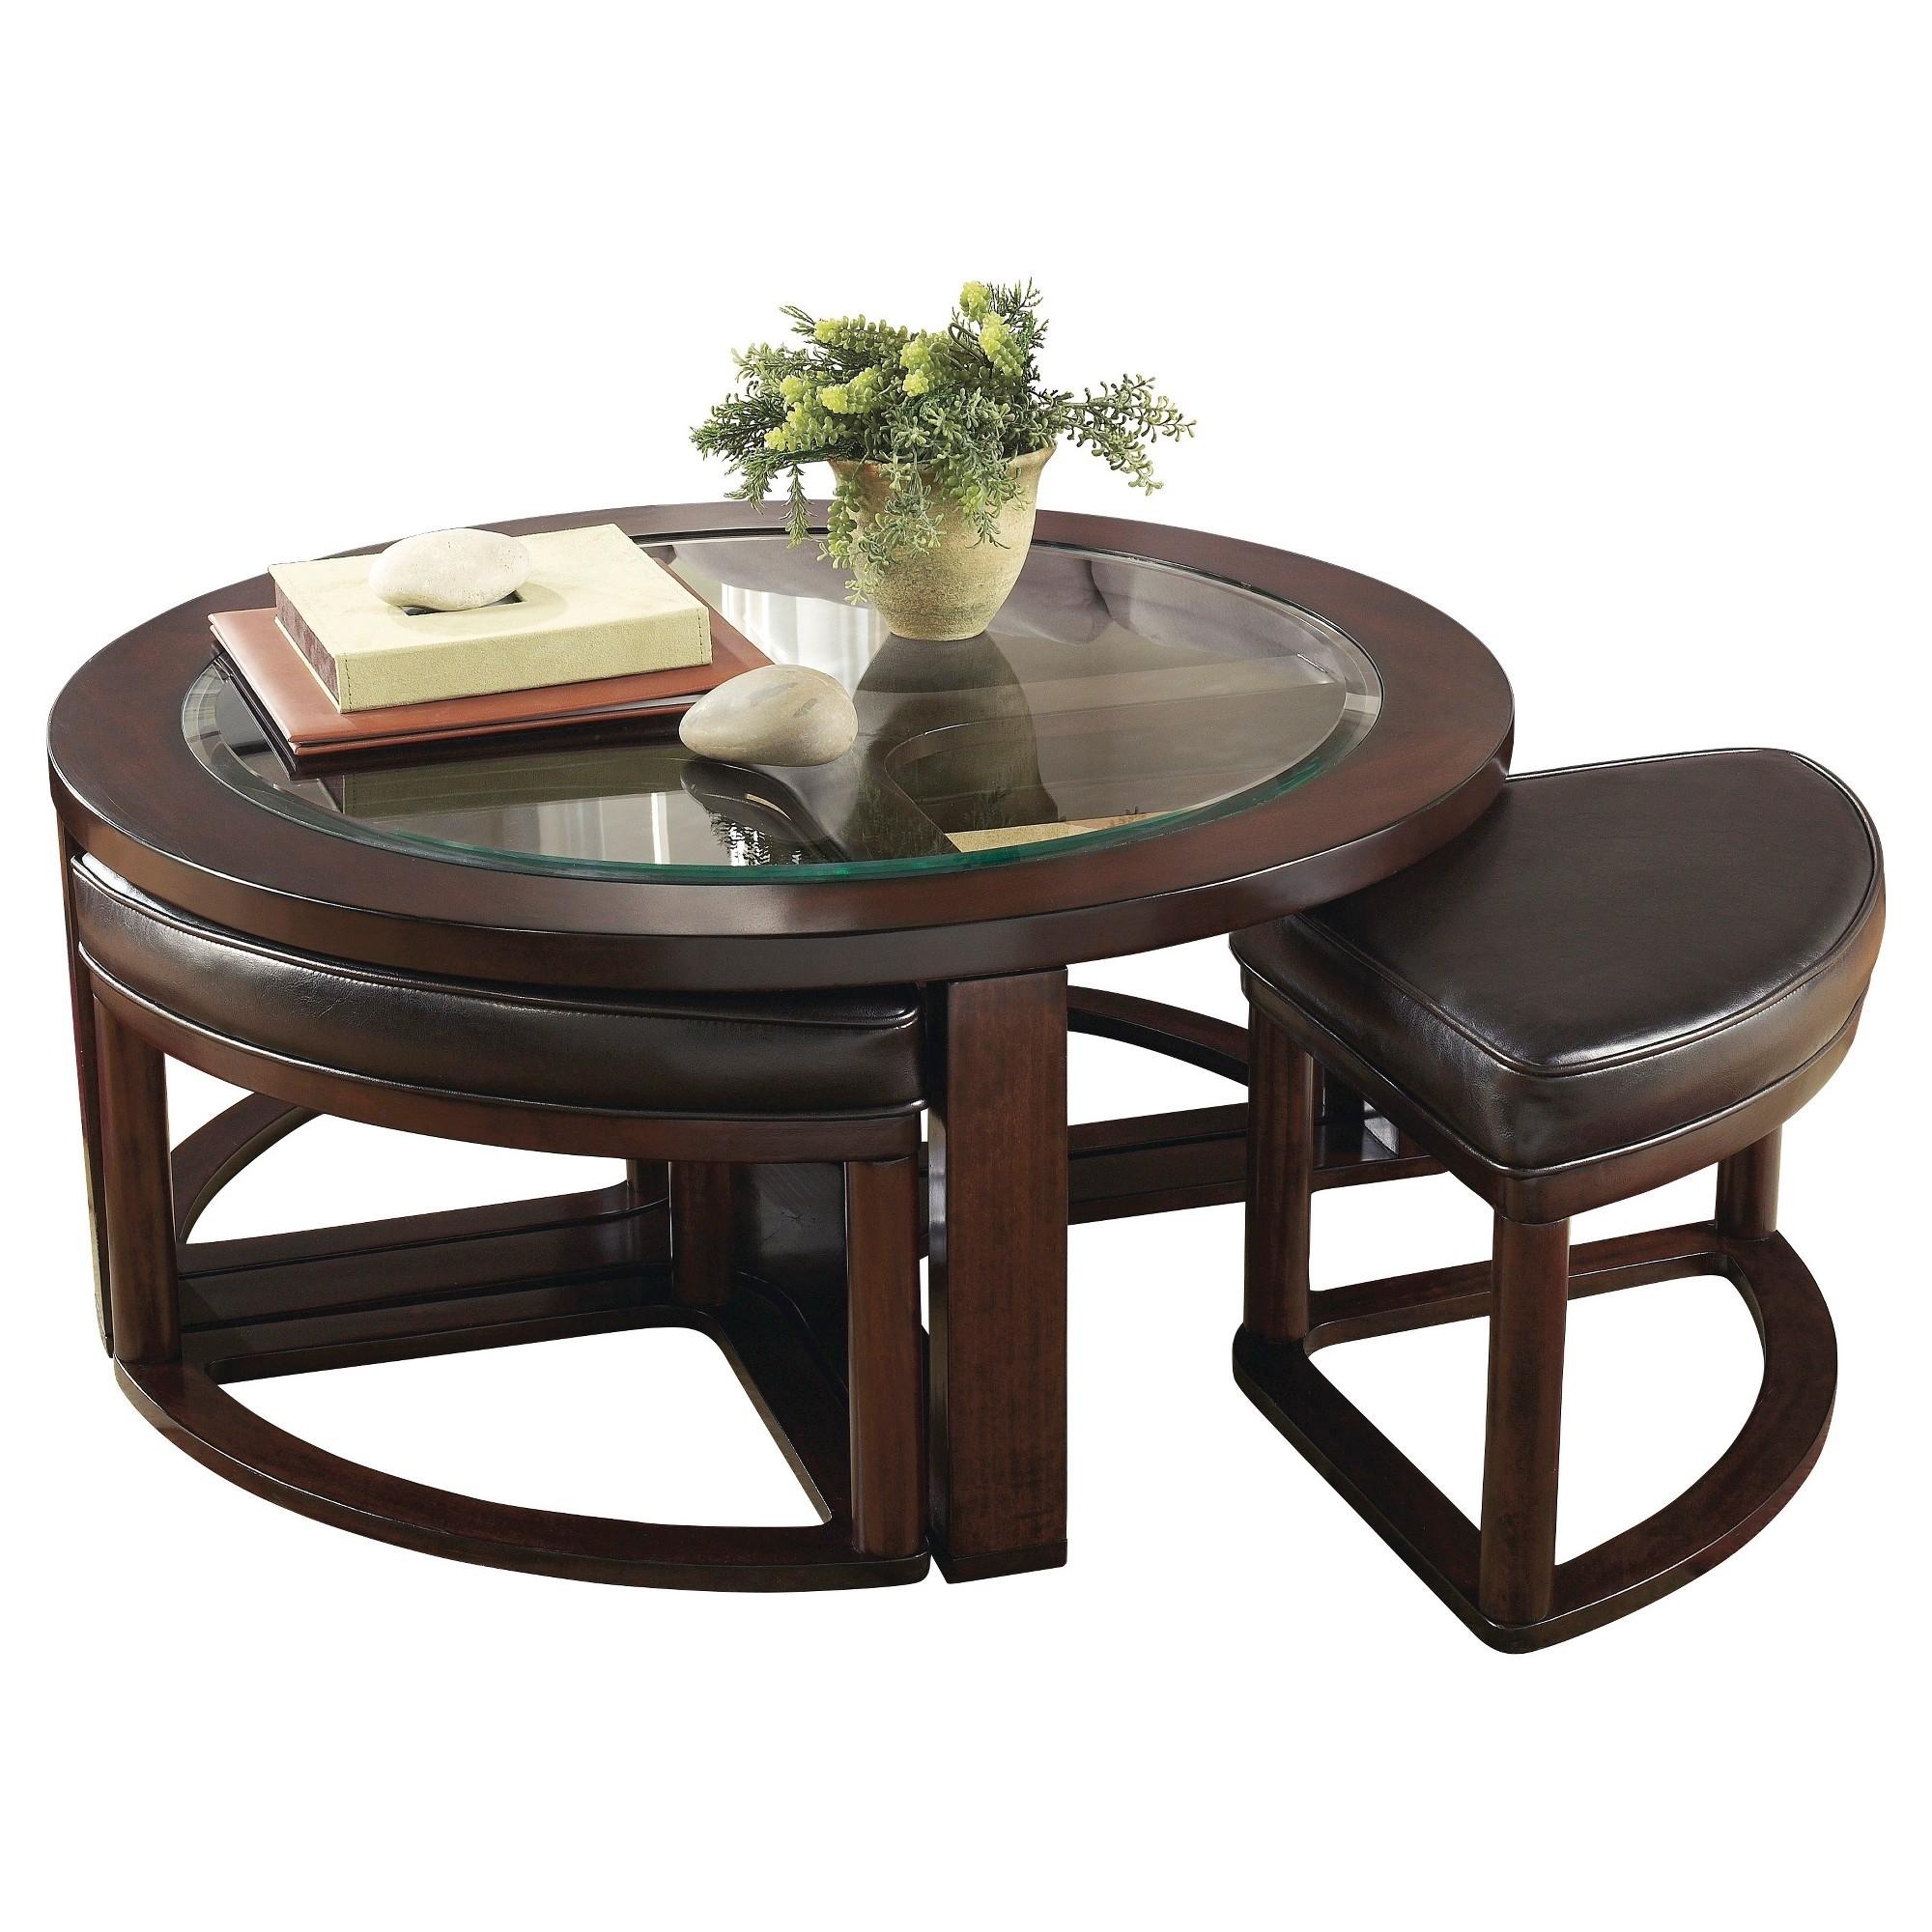 Elegant Machias 5 Piece Coffee Table U0026 Stool Set